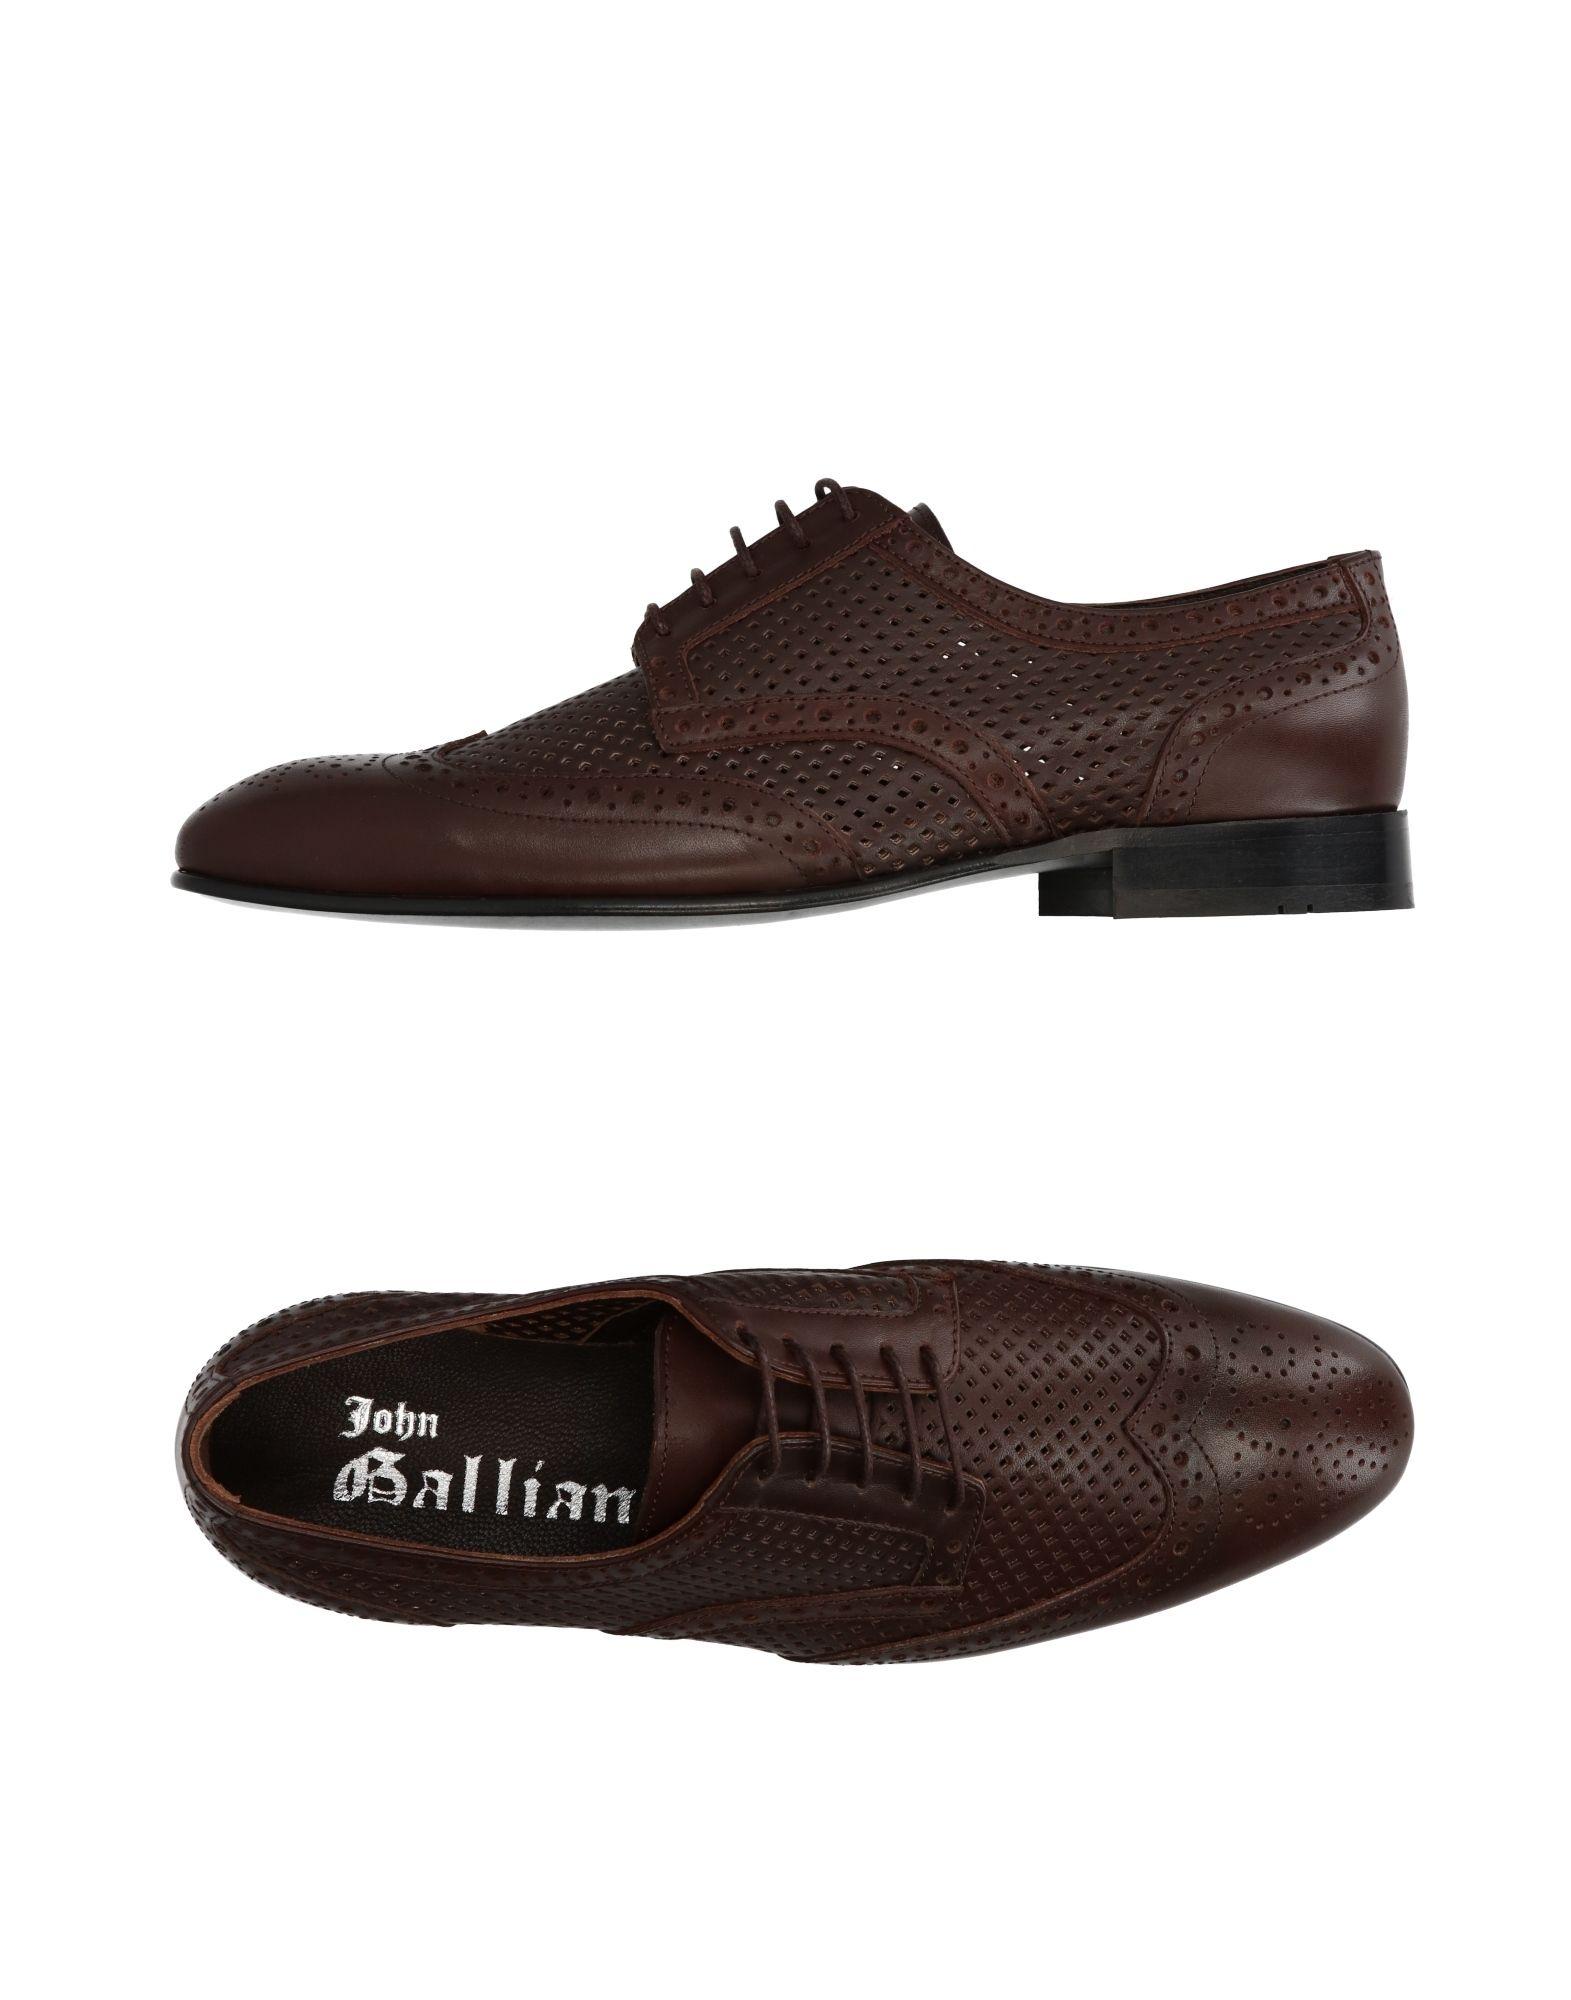 Chaussures À Lacets John Galliano Femme - Chaussures À Lacets John Galliano sur